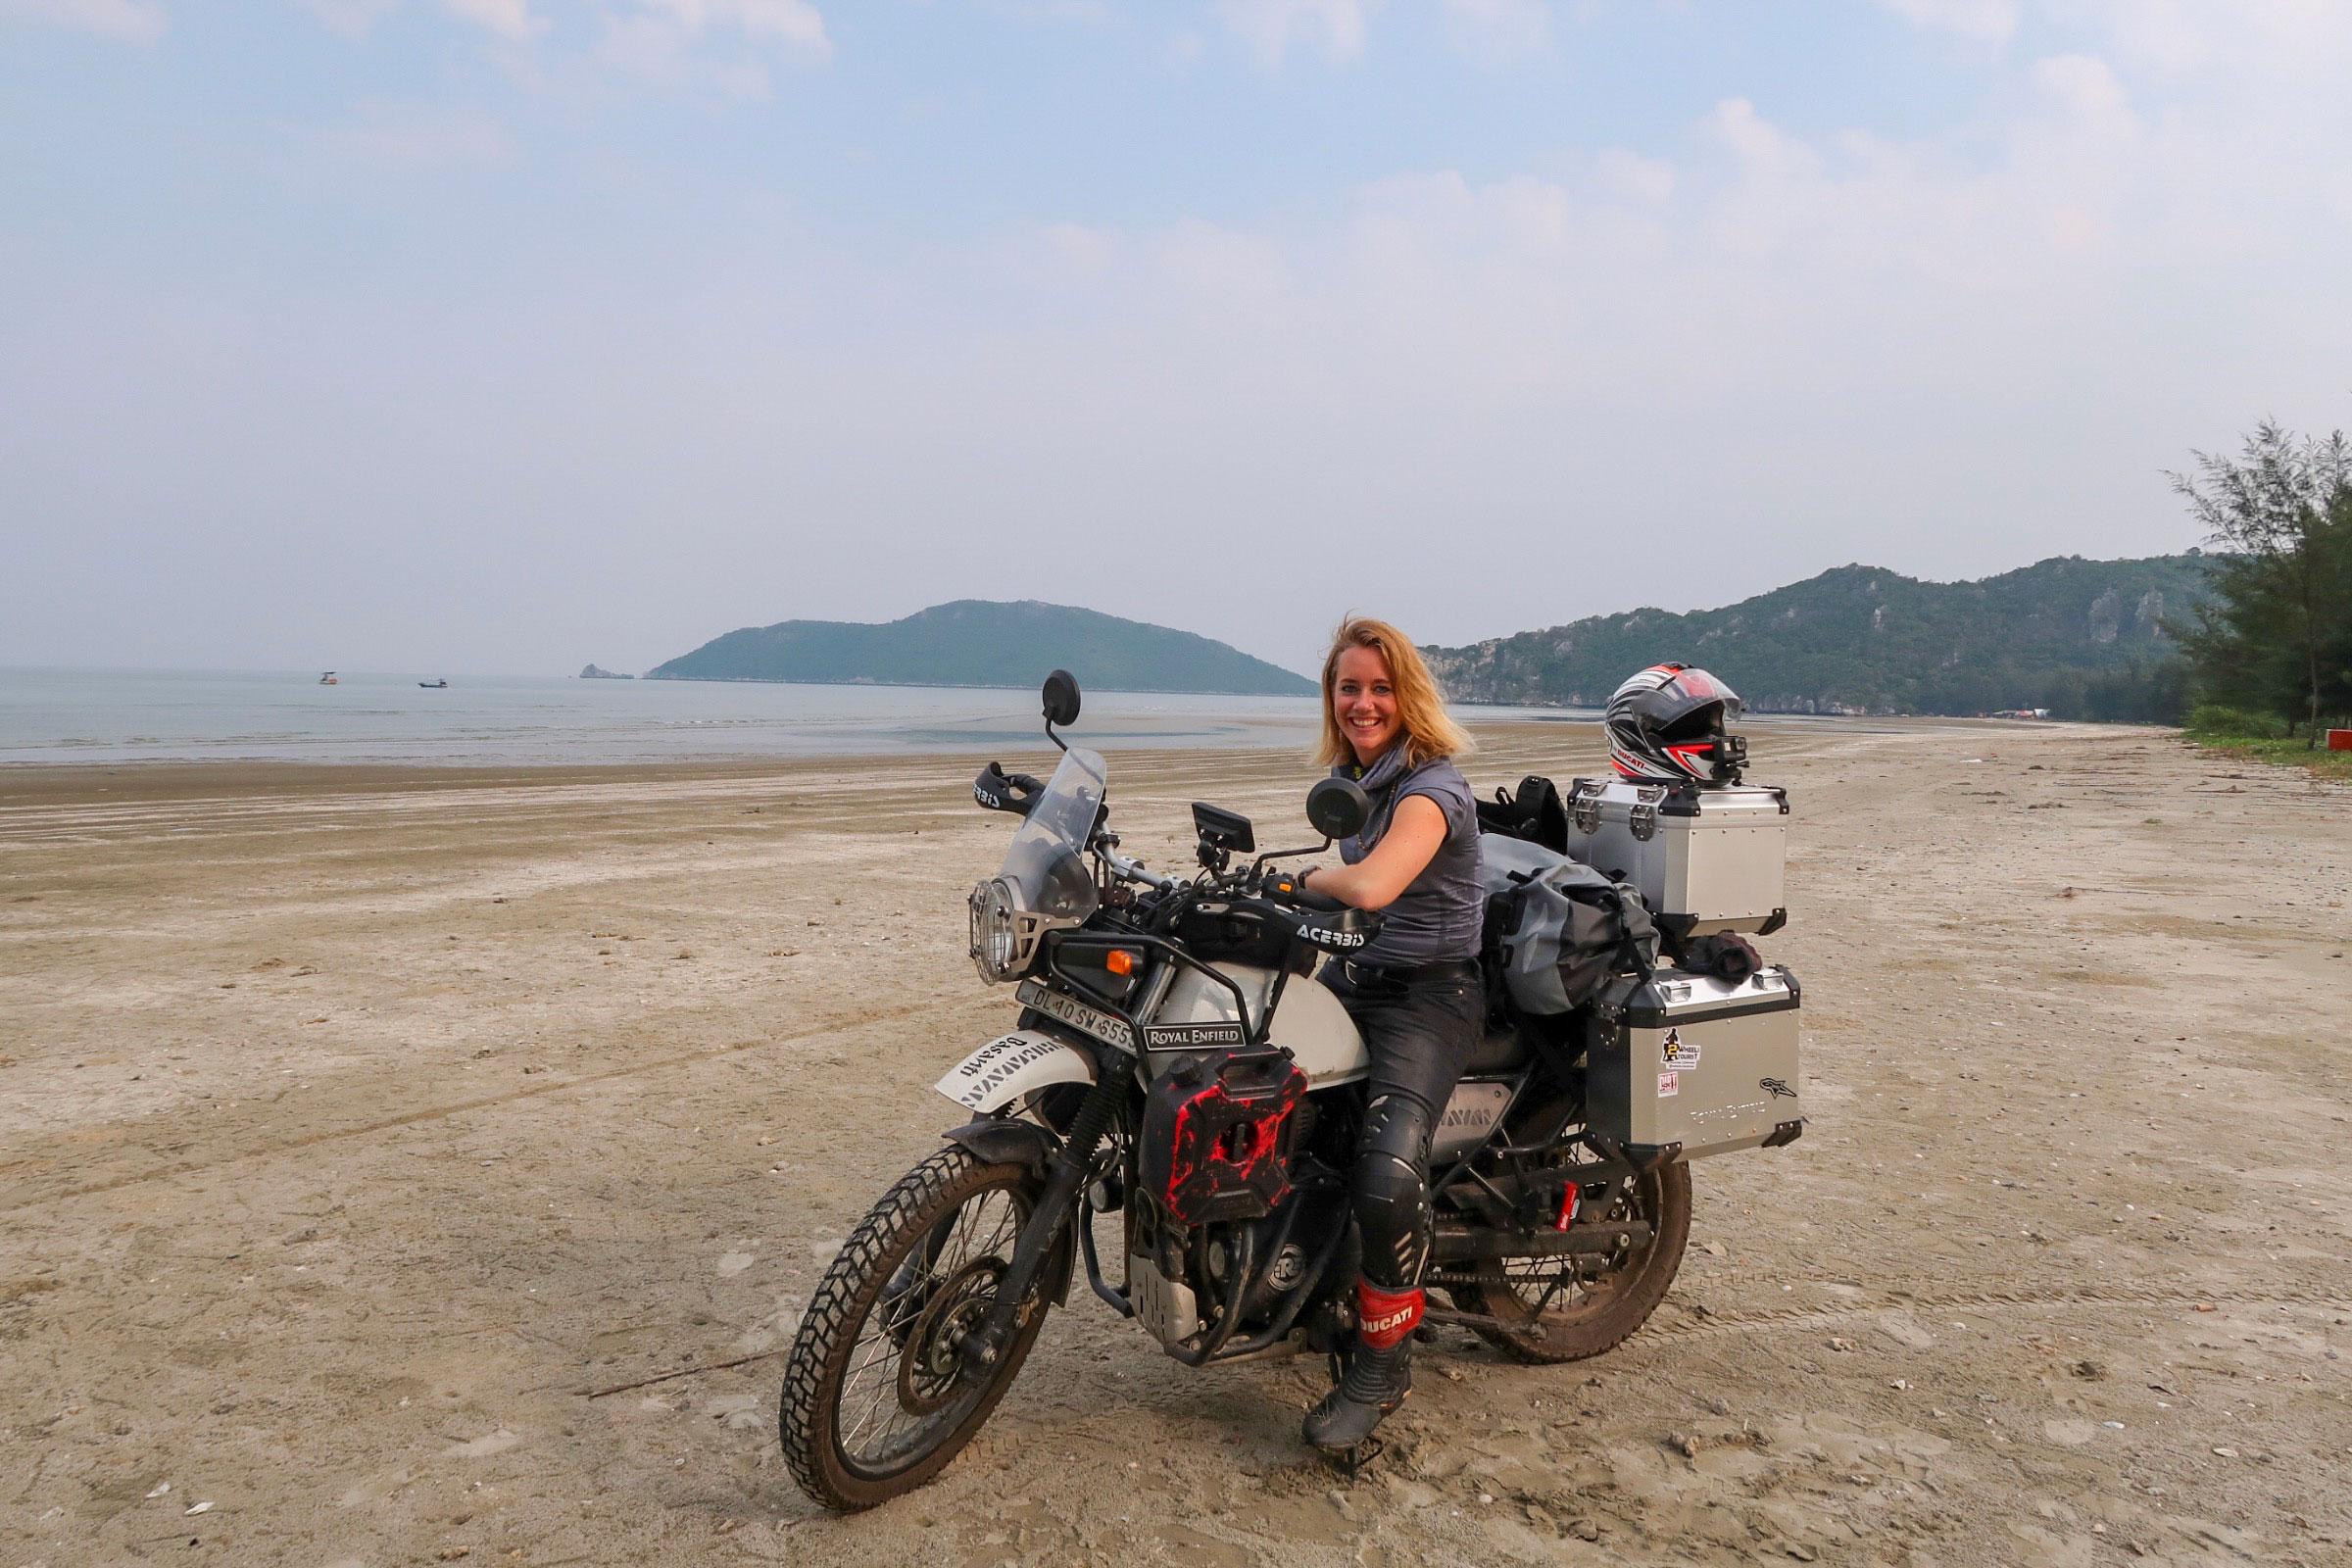 Deserted beach on Thailand